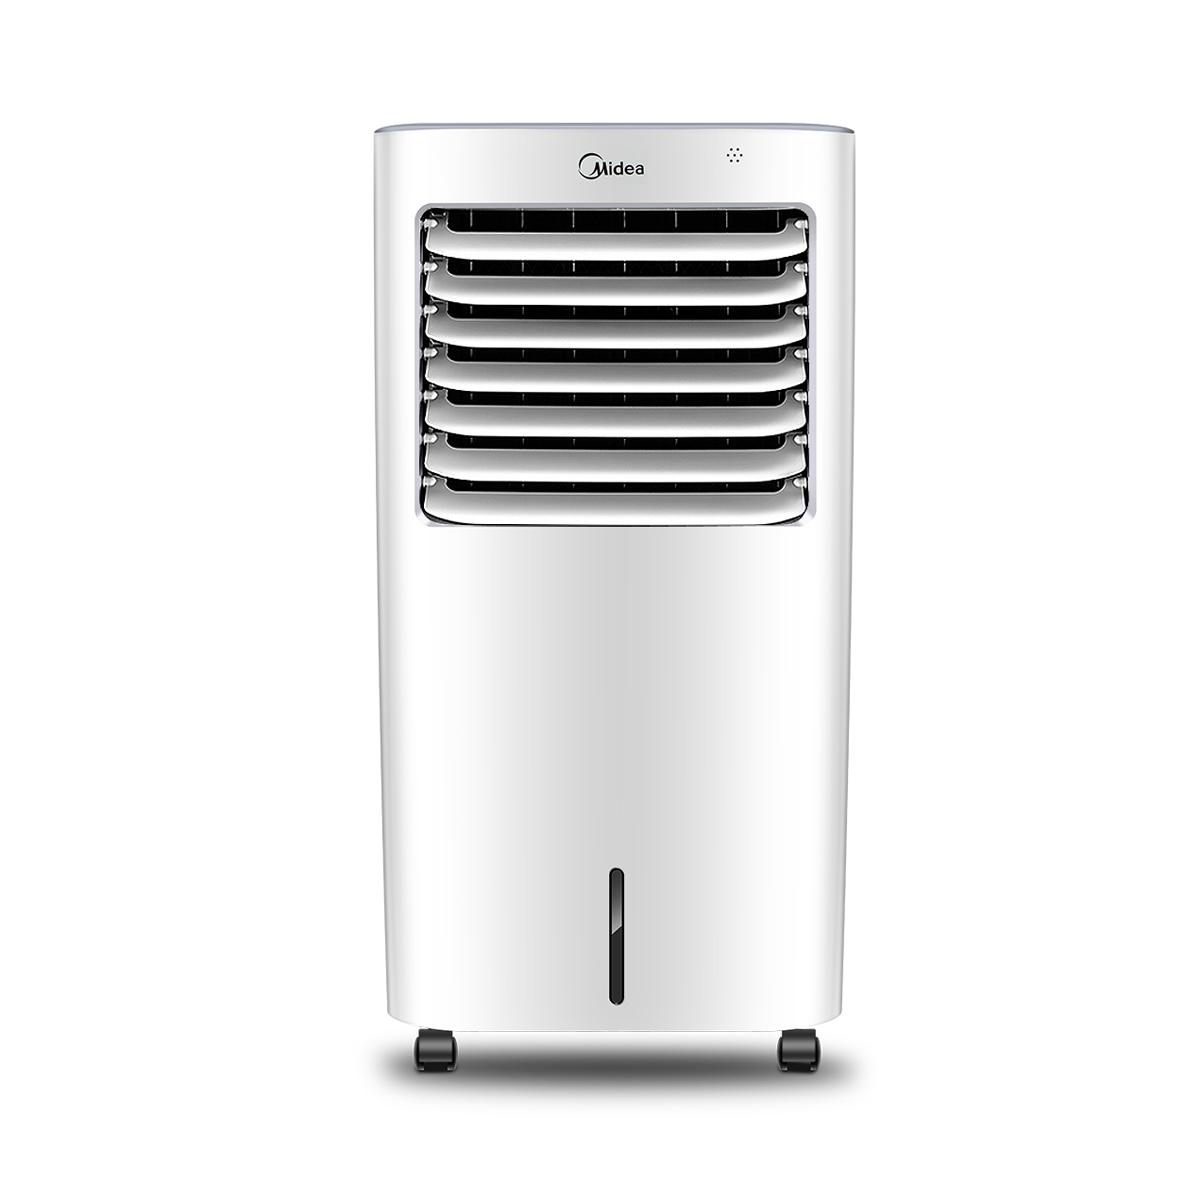 Midea/美的 AC120-17ARW冷塔扇(空调扇) 说明书.pdf